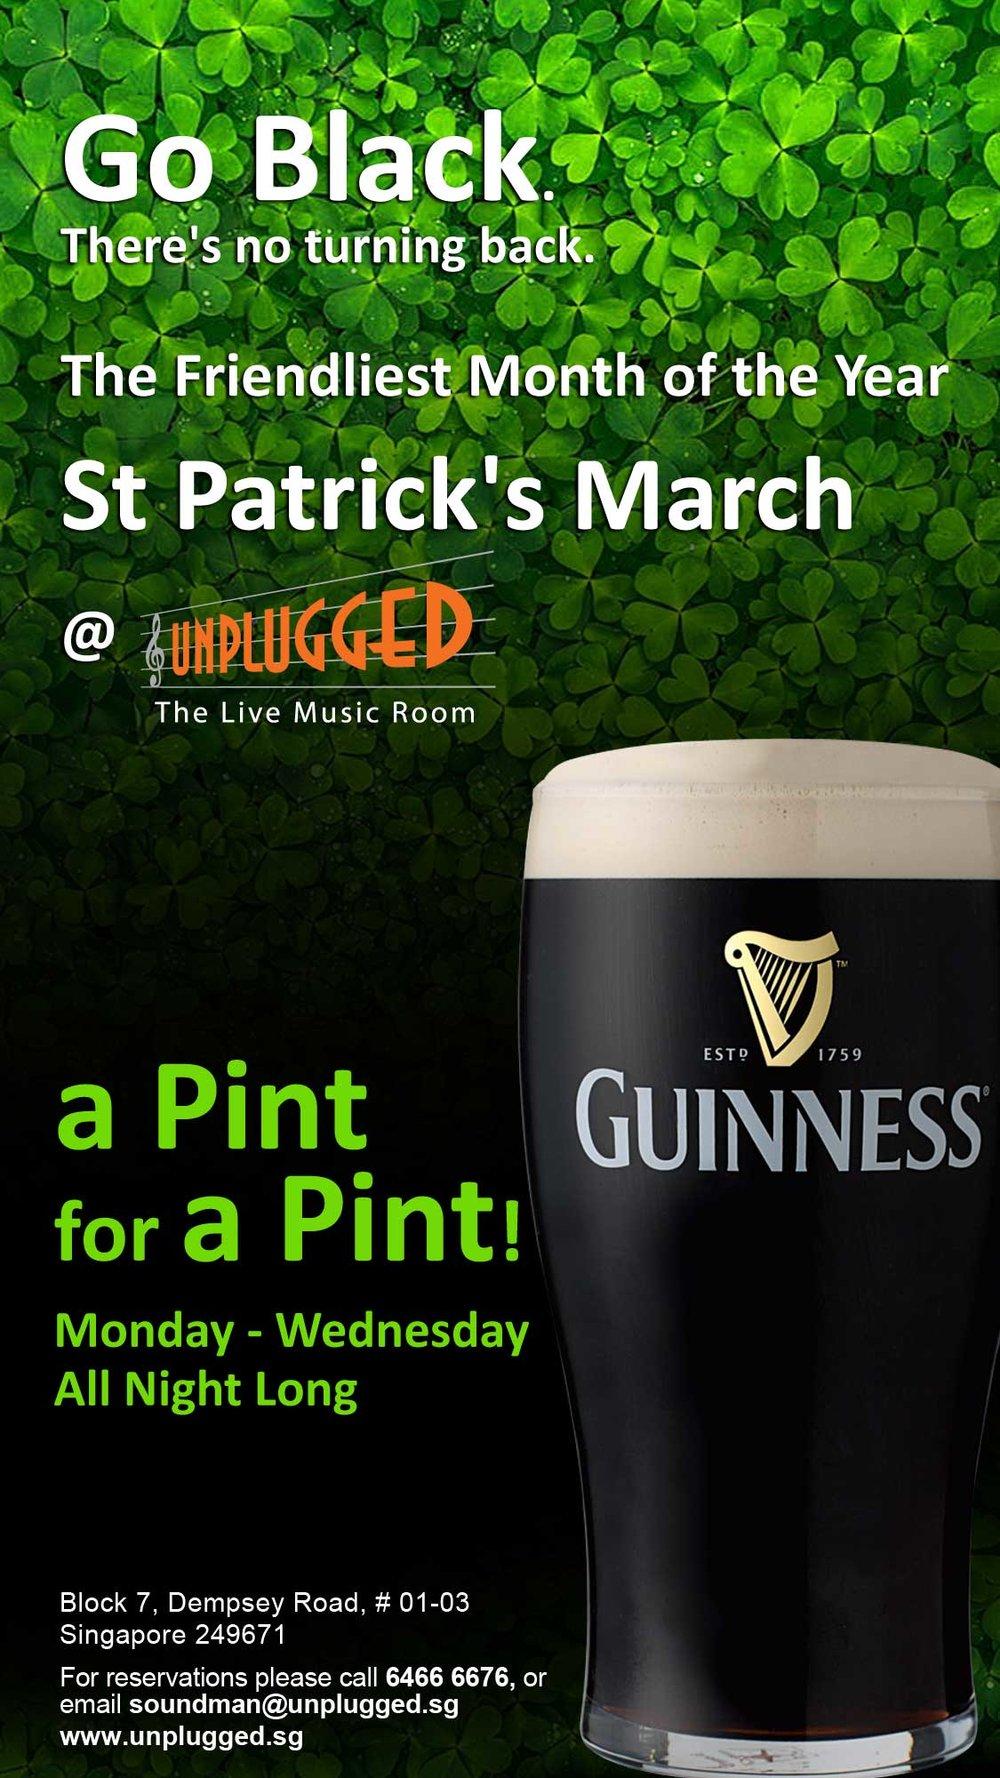 St-Patrick's-march-promo.jpg